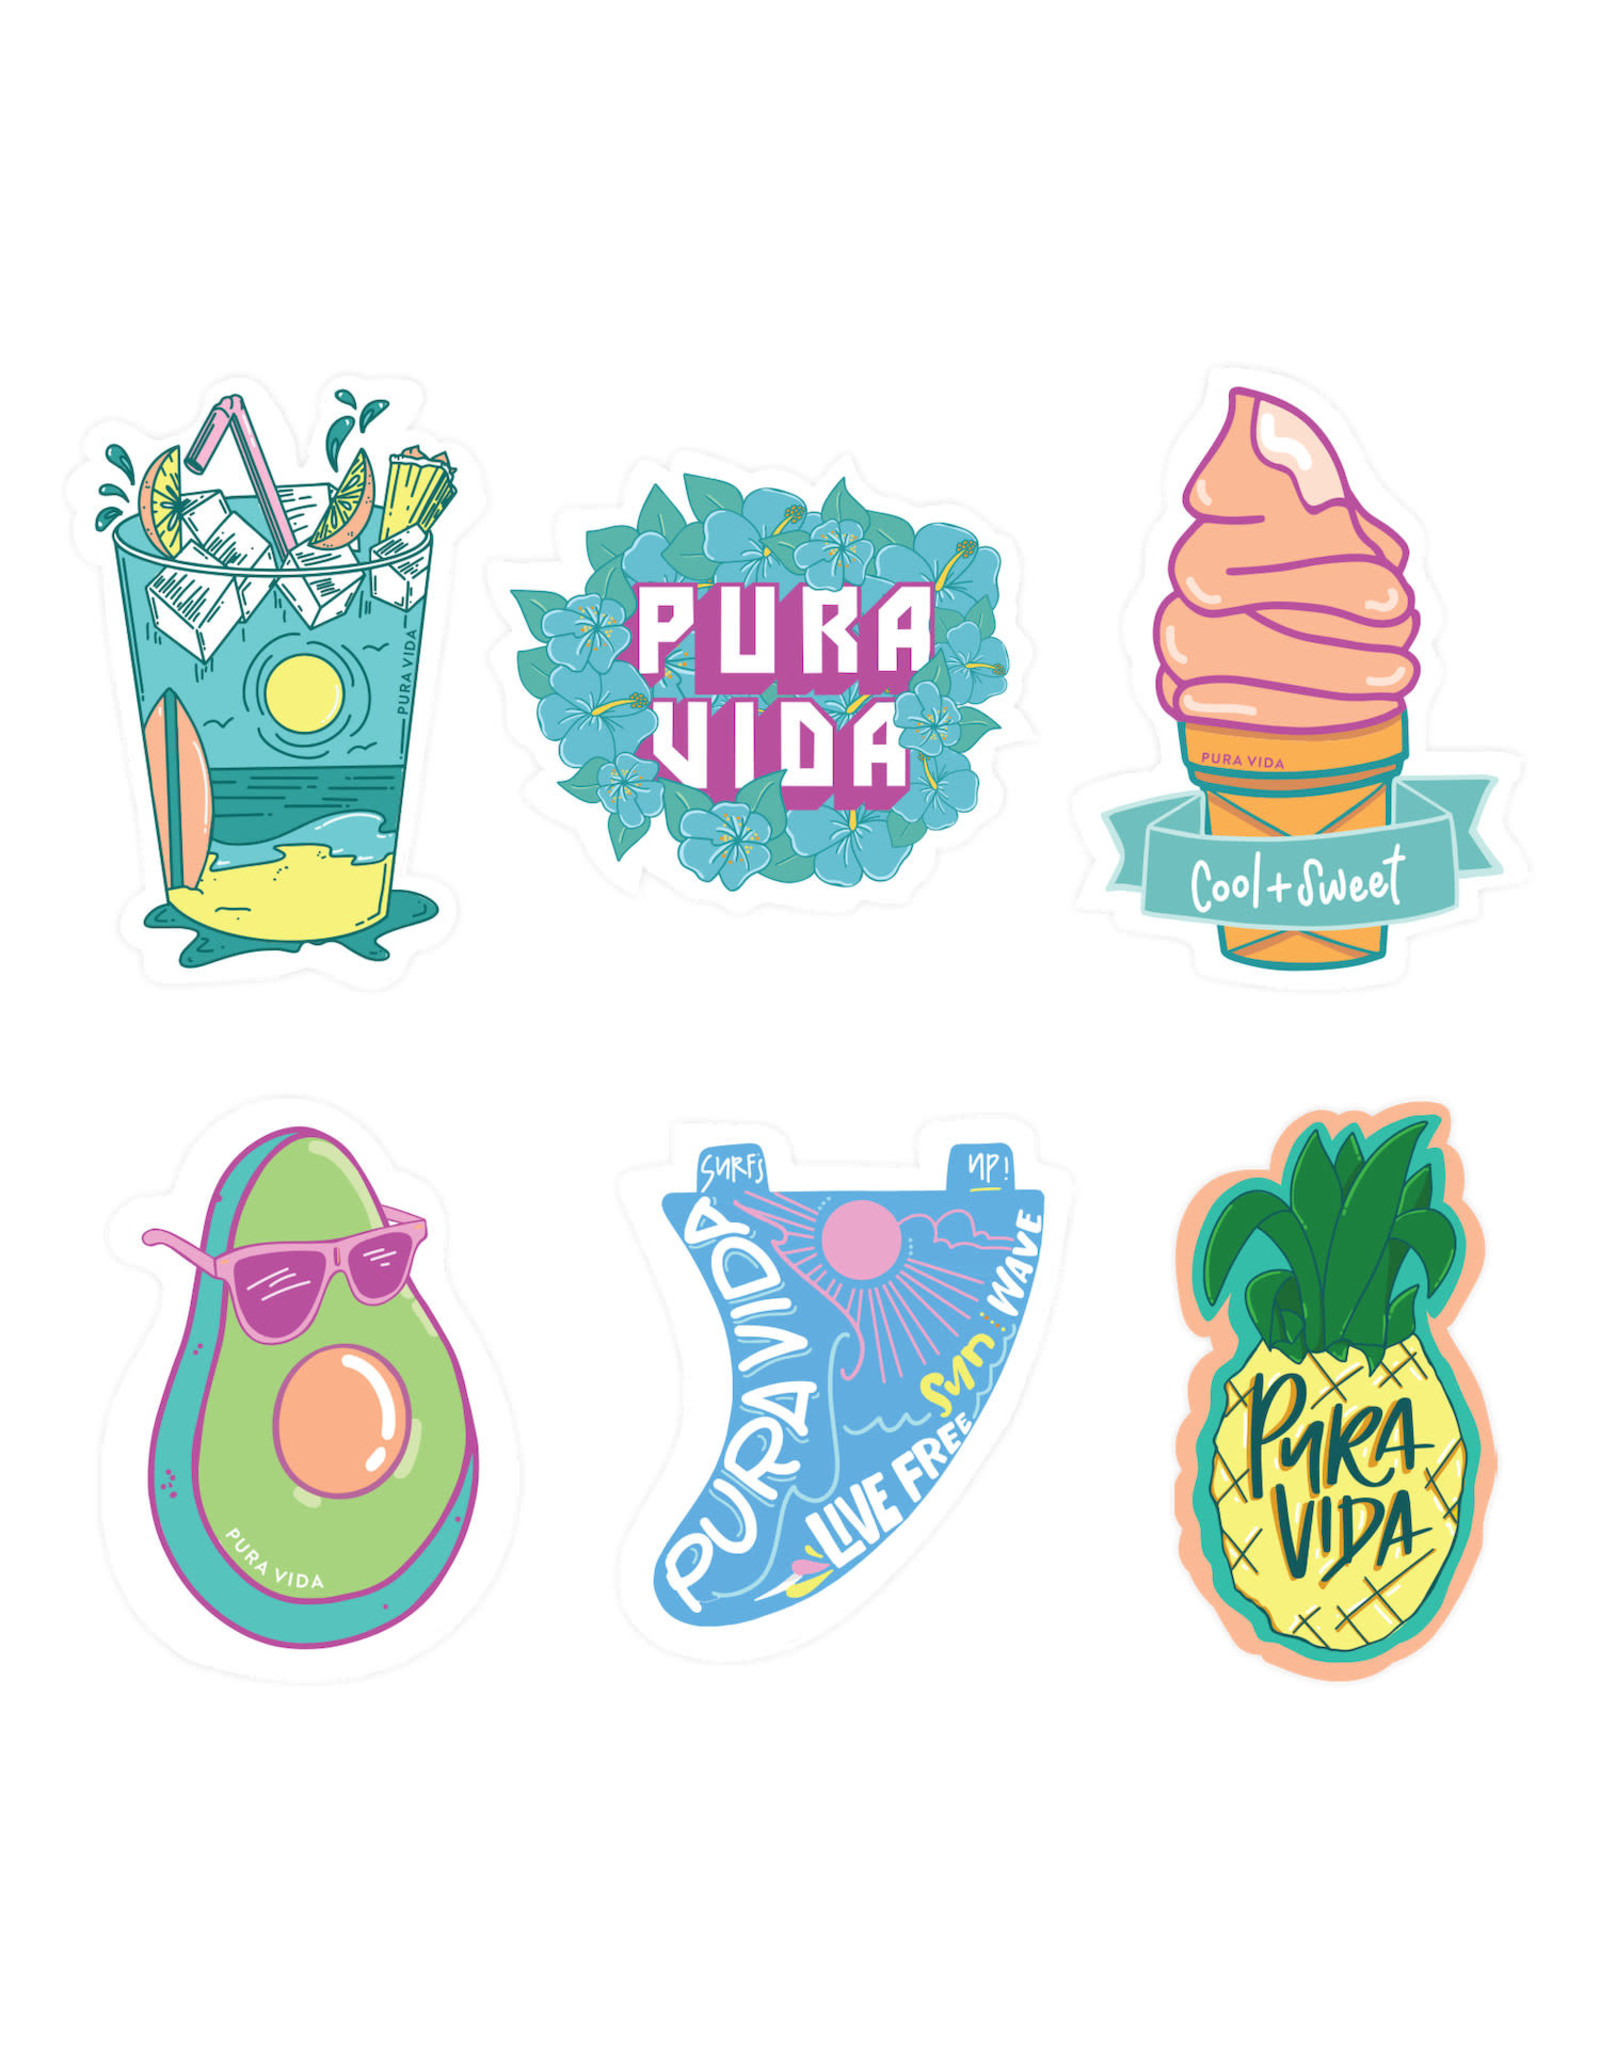 PURA VIDA 6 STICKER SHEET COOL AND SWEET